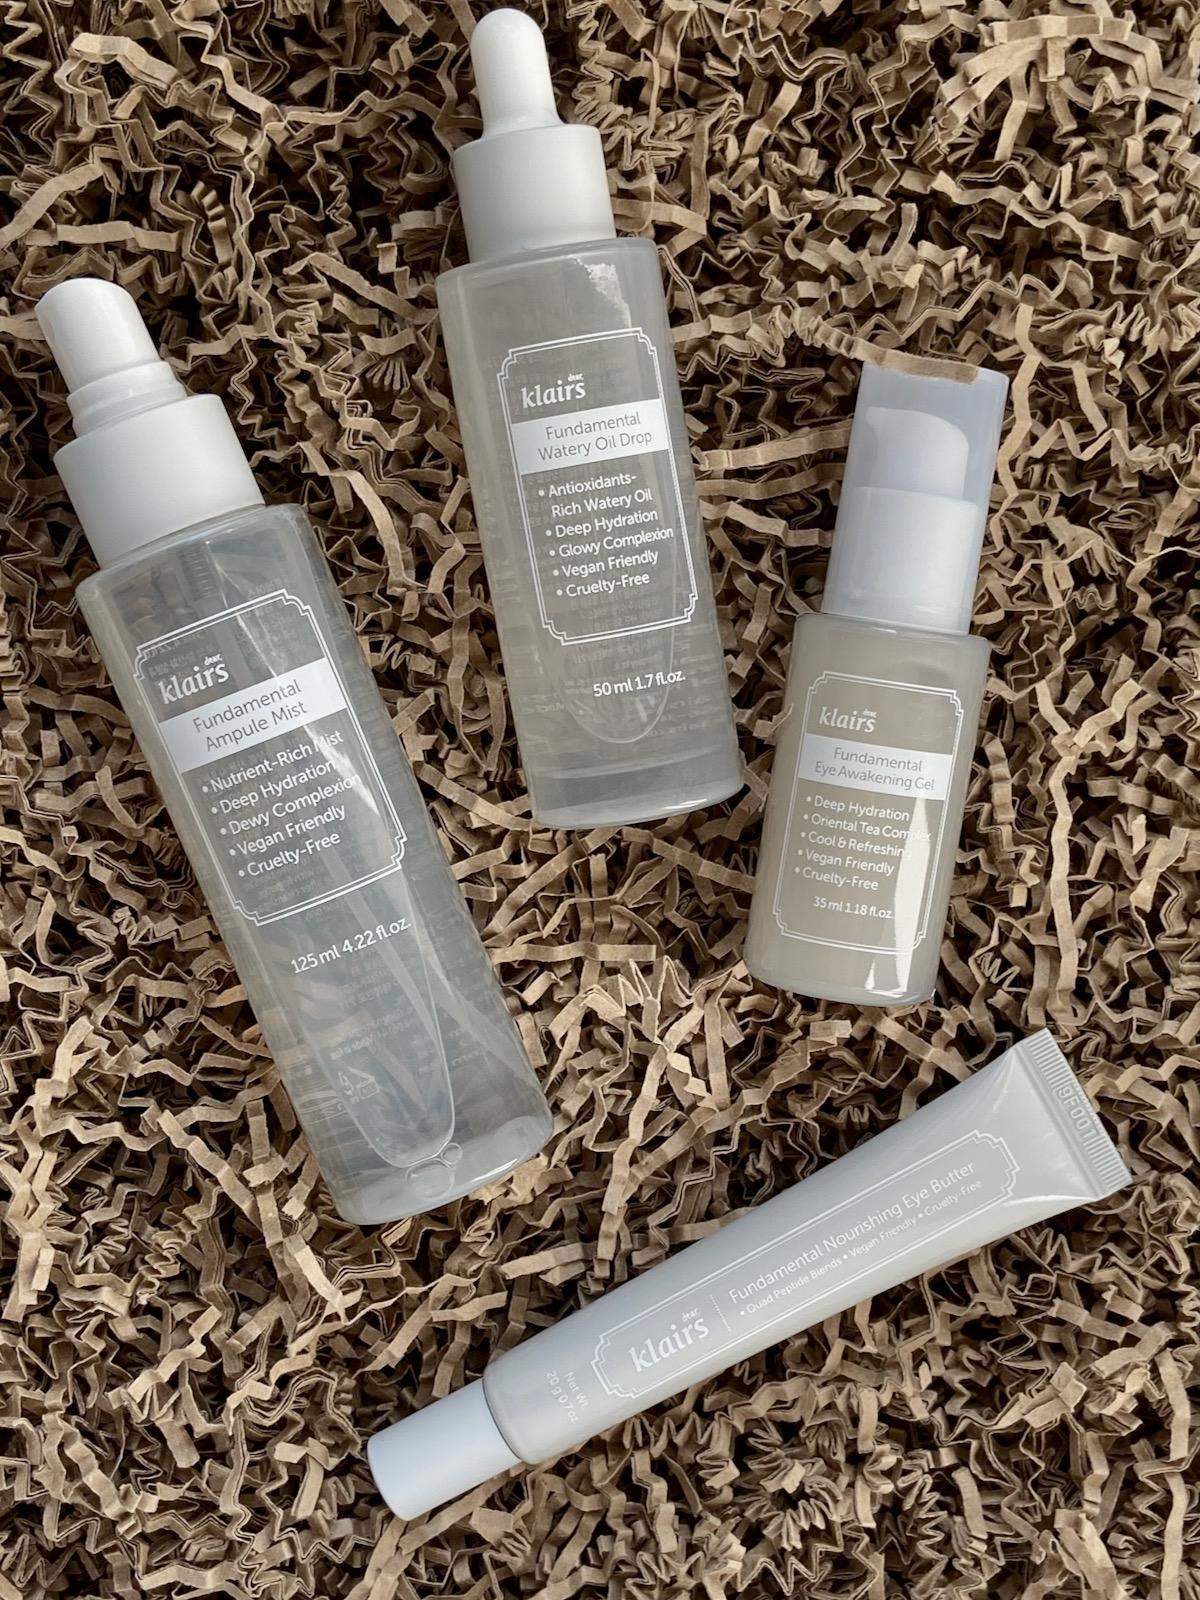 Klairs Fundamental Serie Ampule Mist Watery Oil Drops Eye Awakening Gel Nourishing Eye Butter